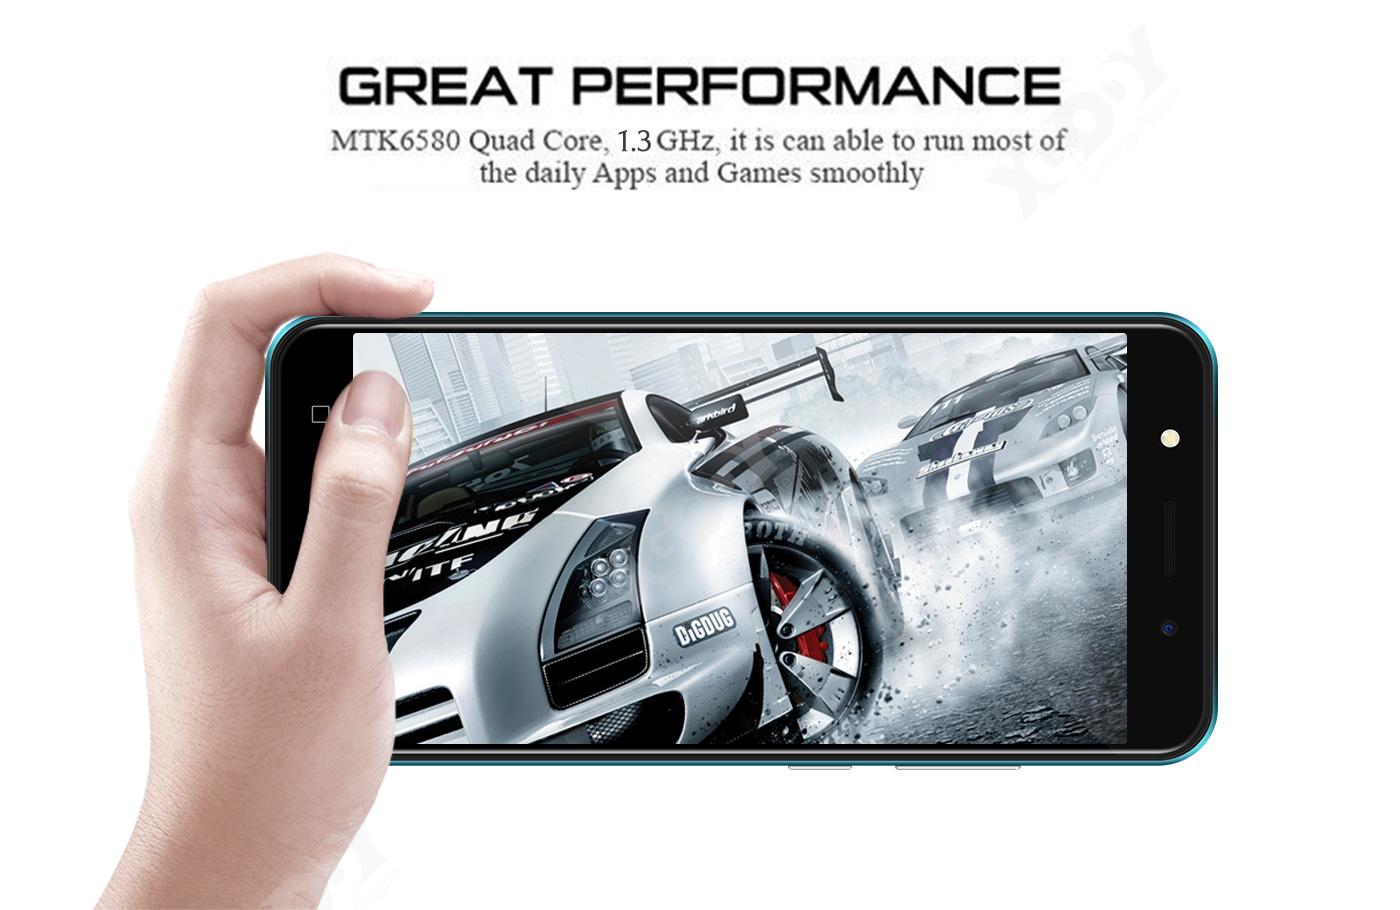 5″ Android 8.1 Unlocked Cheap Mobile Smart Phone Quad Core Dual SIM WiFi 3G GPS